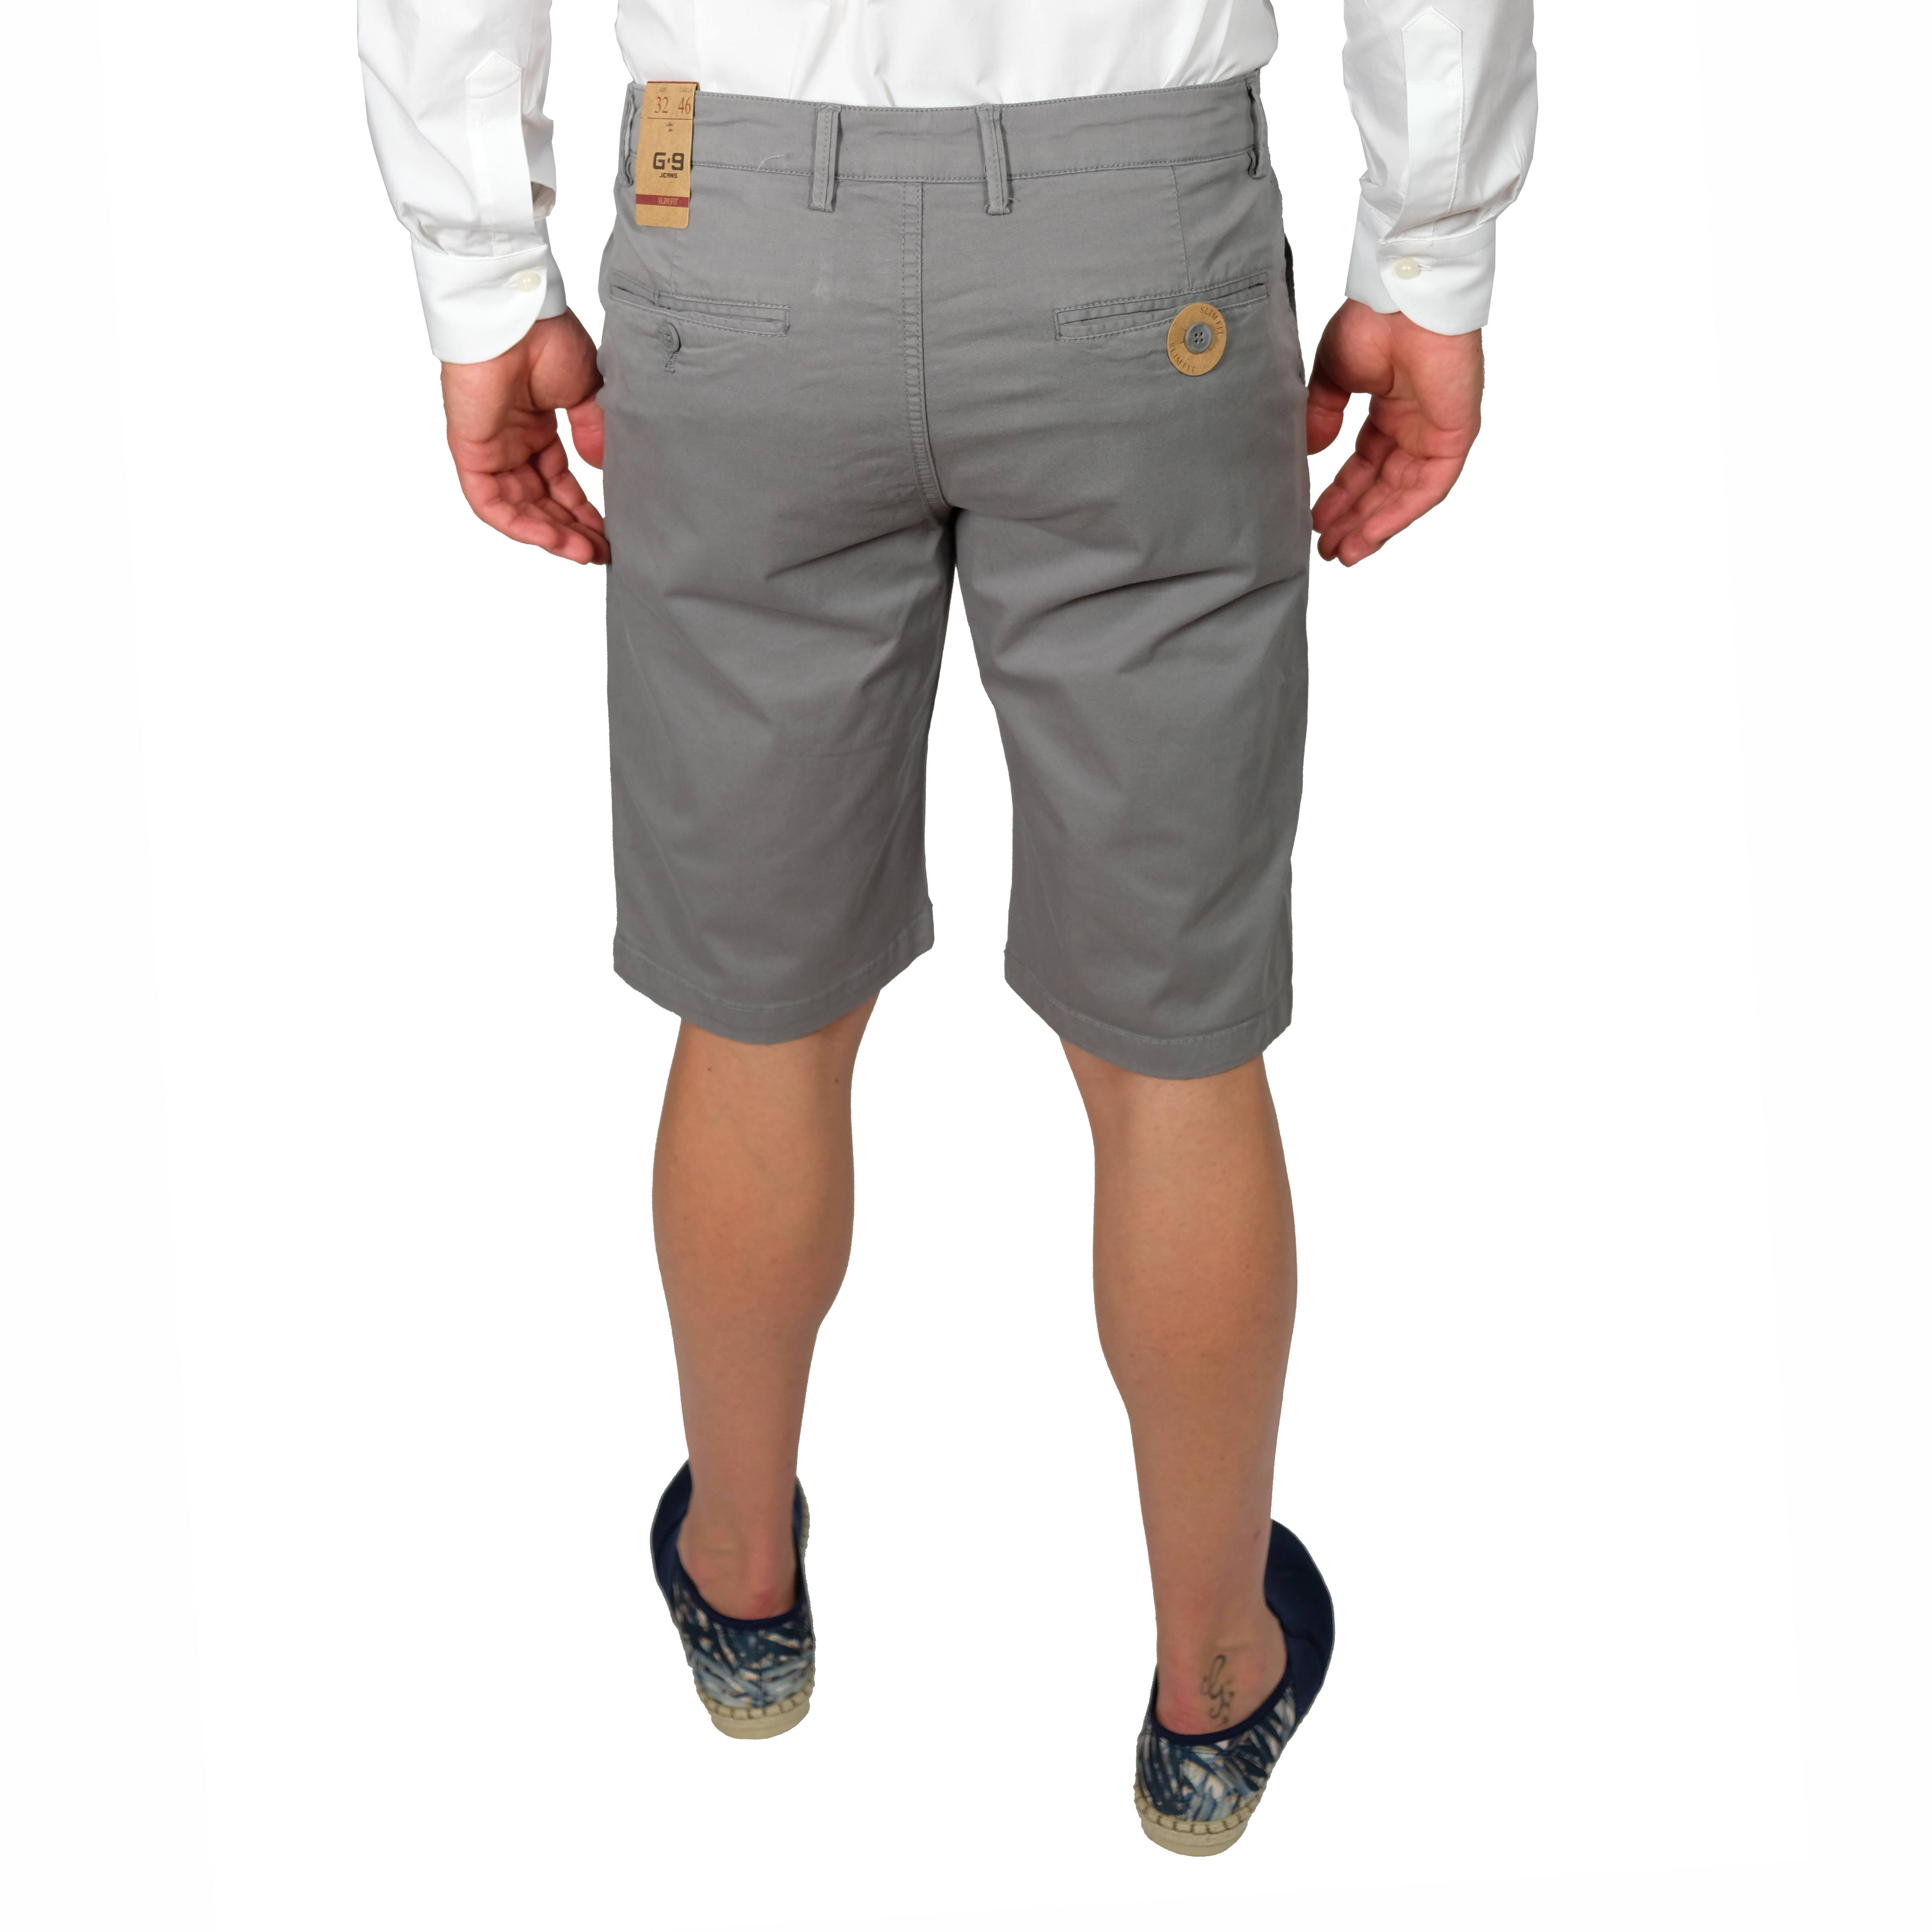 Bermuda-Uomo-Cotone-Jeans-Pantaloncini-Pantaloni-Corti-Tasca-America-Slim-Shorts miniatura 4